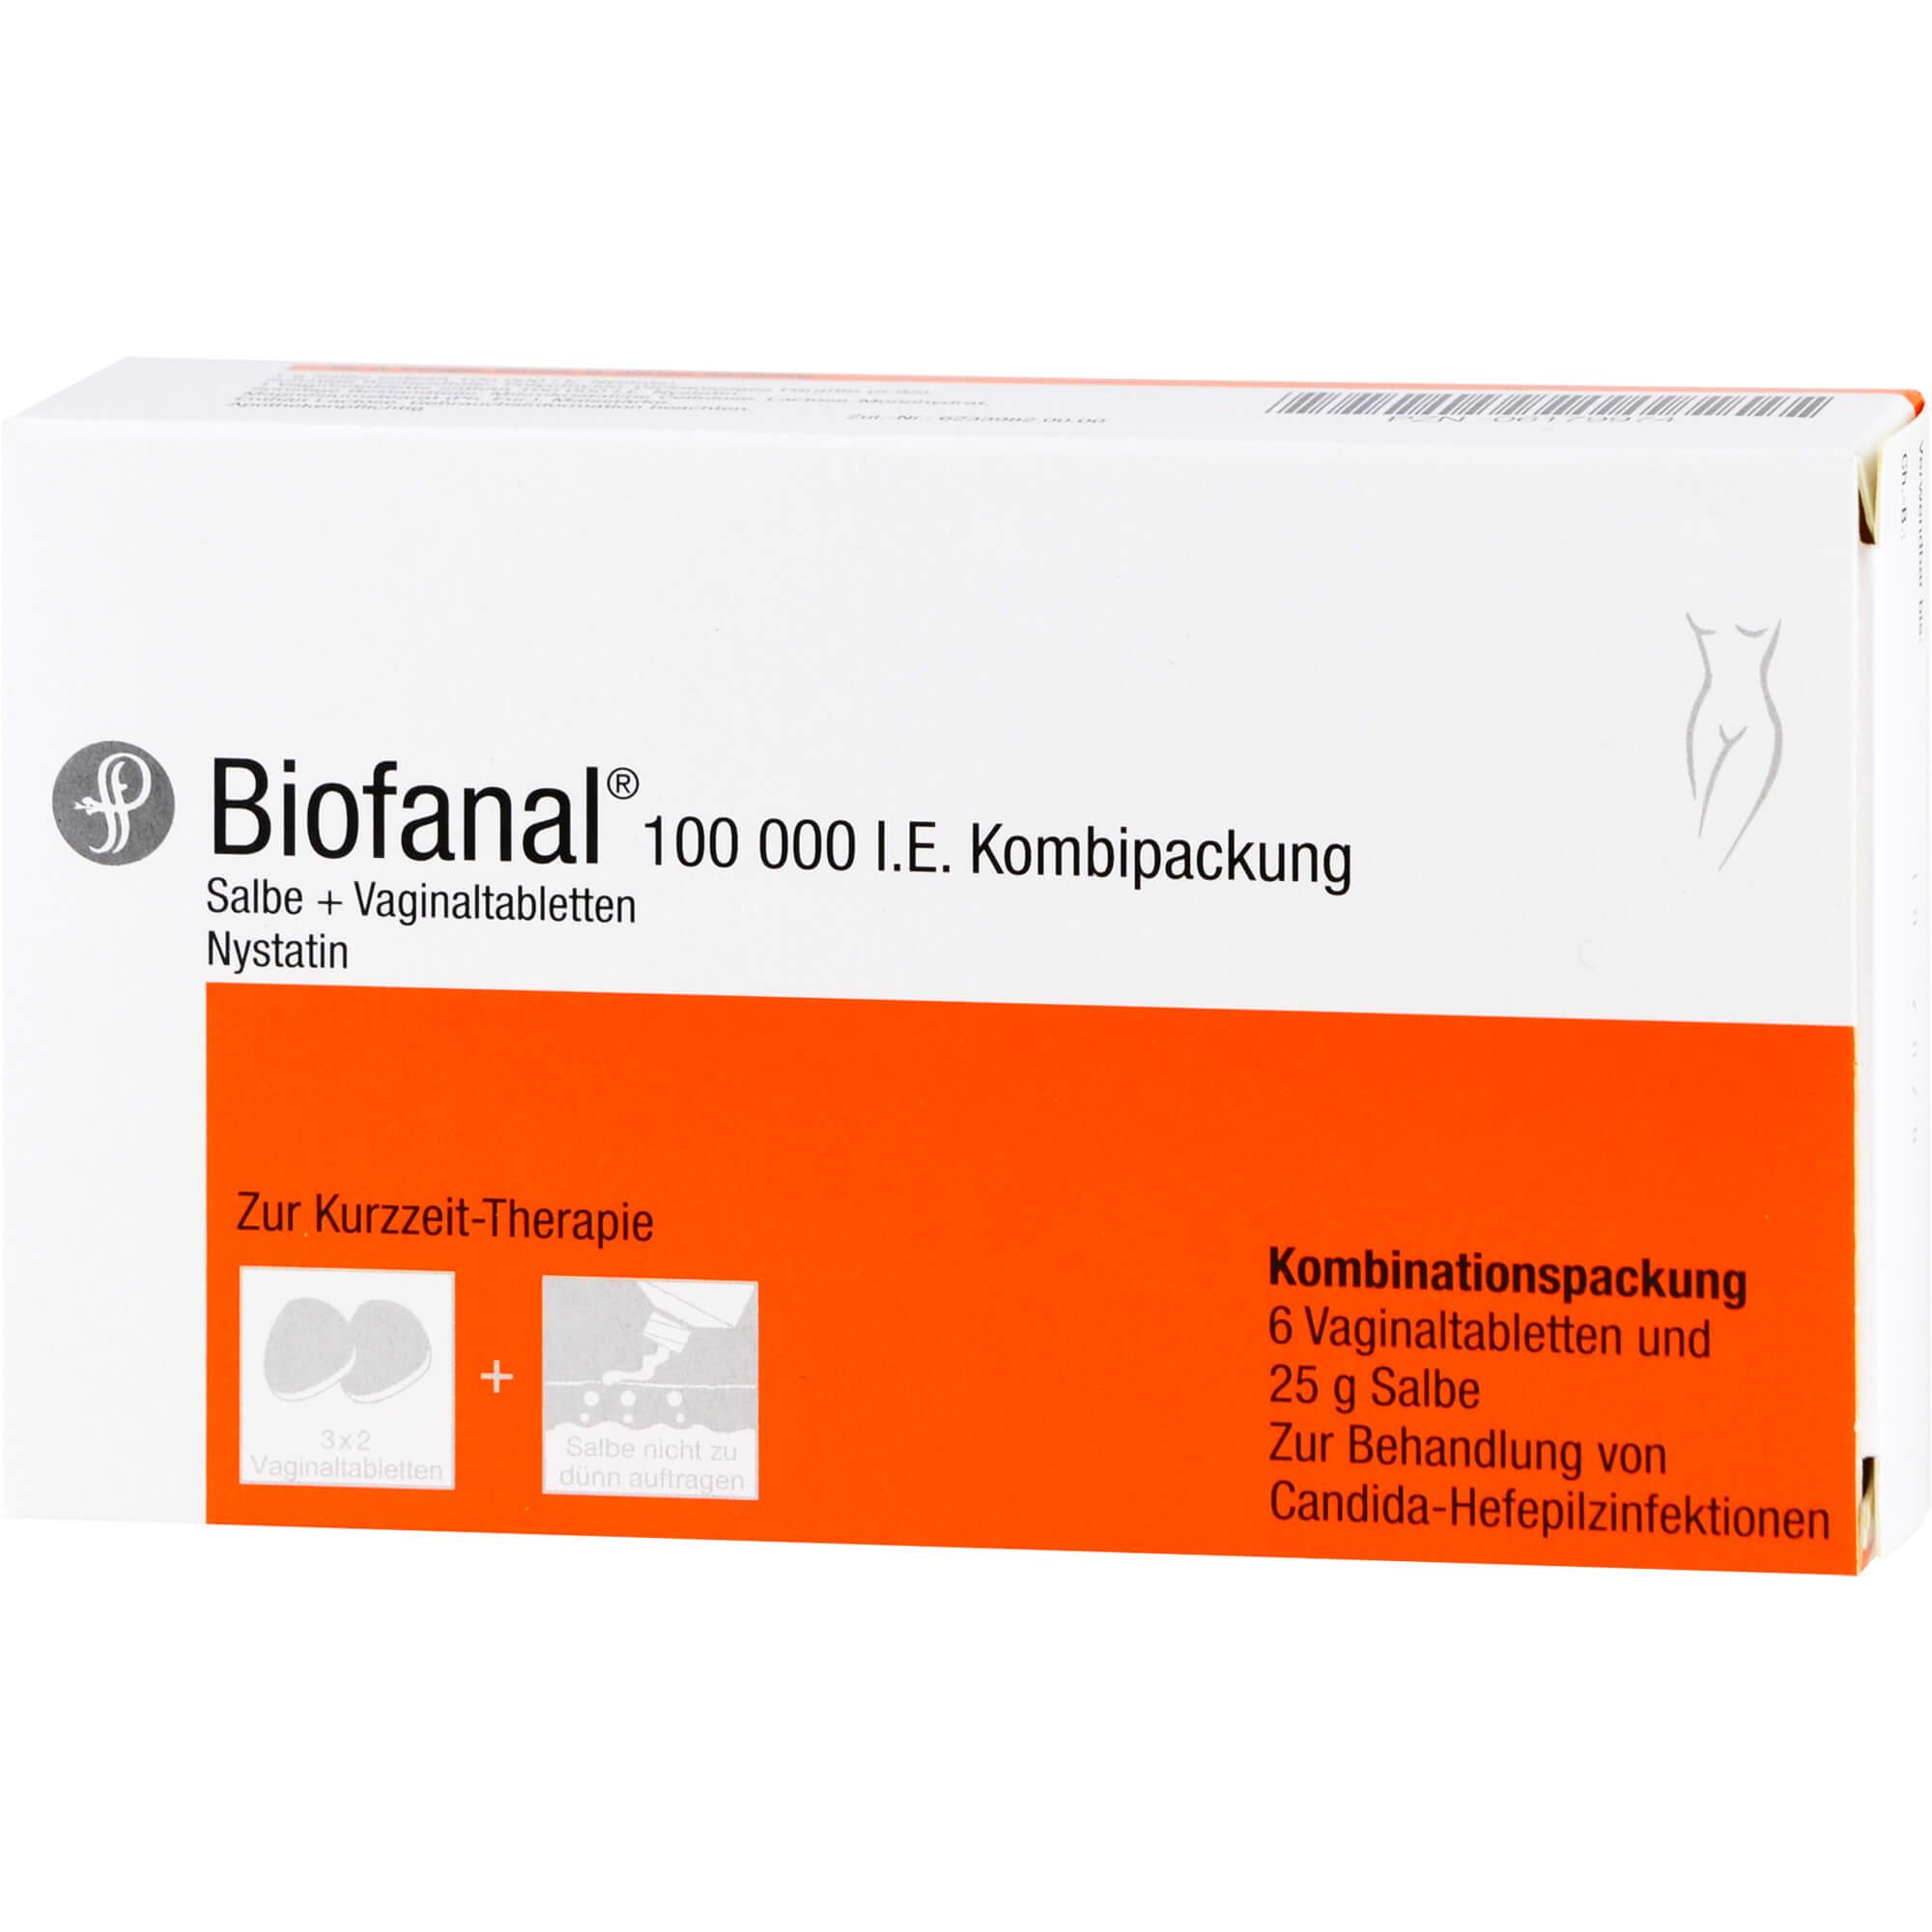 BIOFANAL Kombip. 25g Salbe + 6 Vag.Tbl.